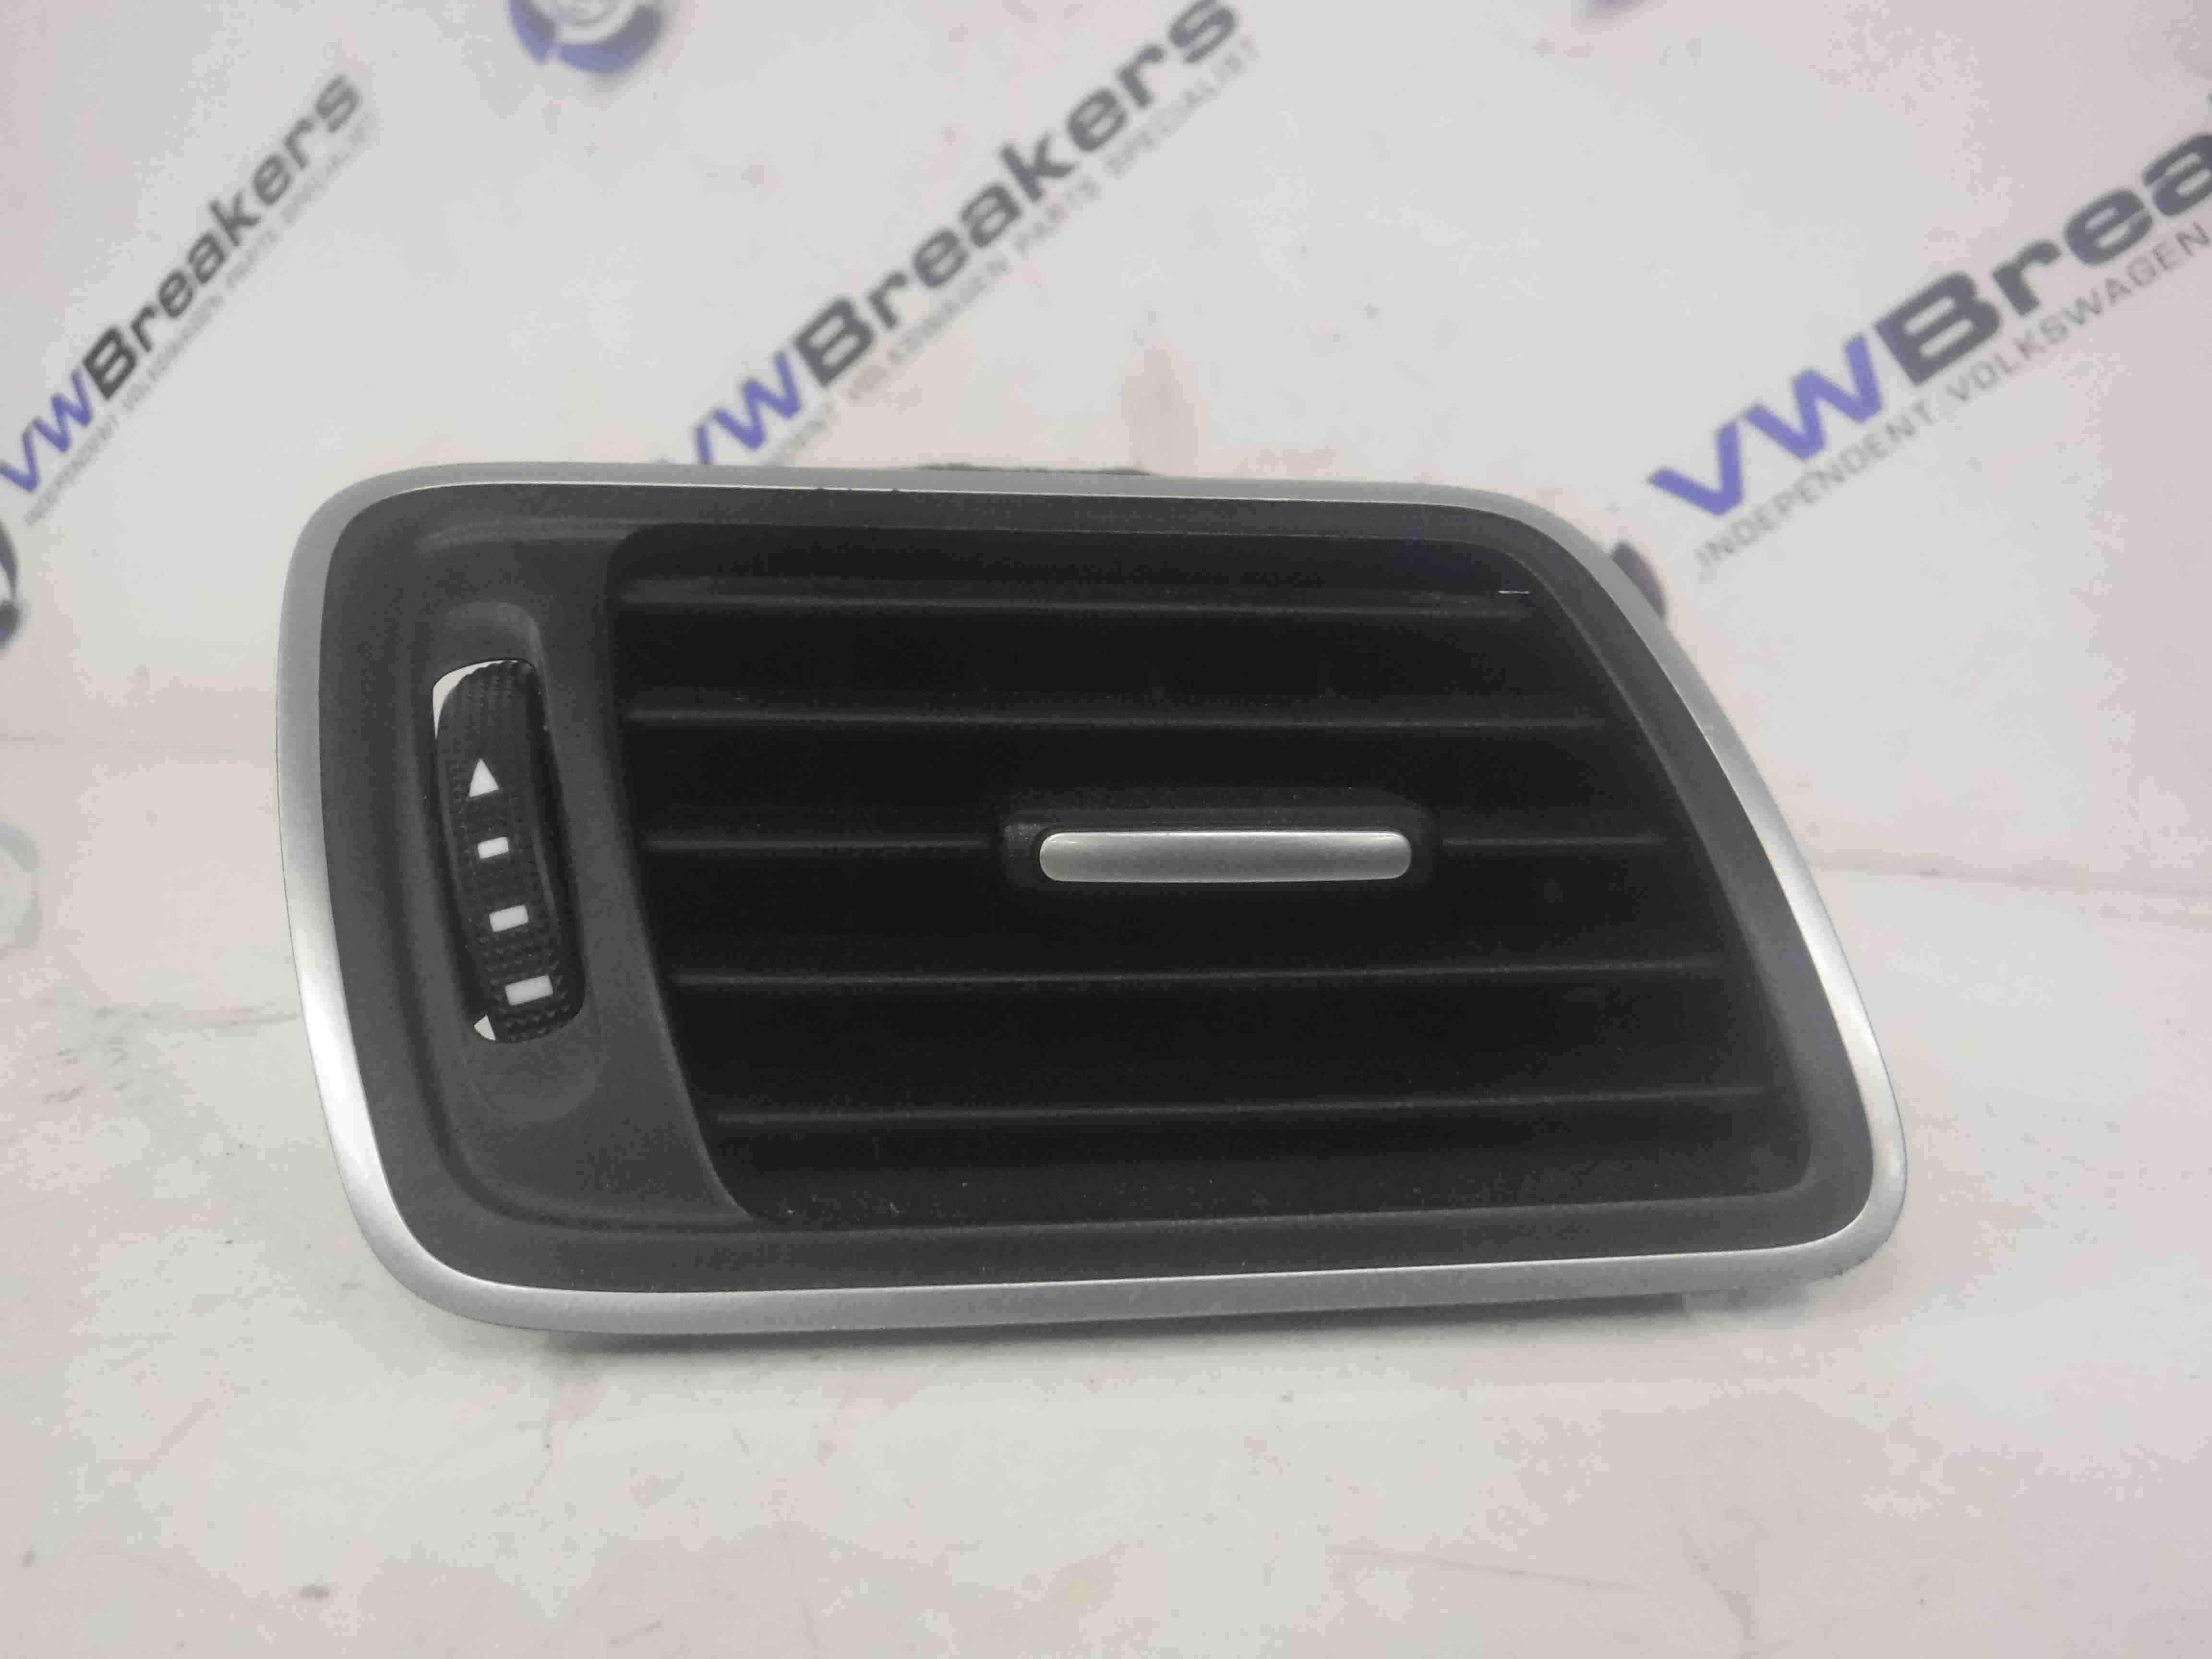 Volkswagen Passat B7 2010-2015 Drivers OSF Front Heater Vent 3AC819702A